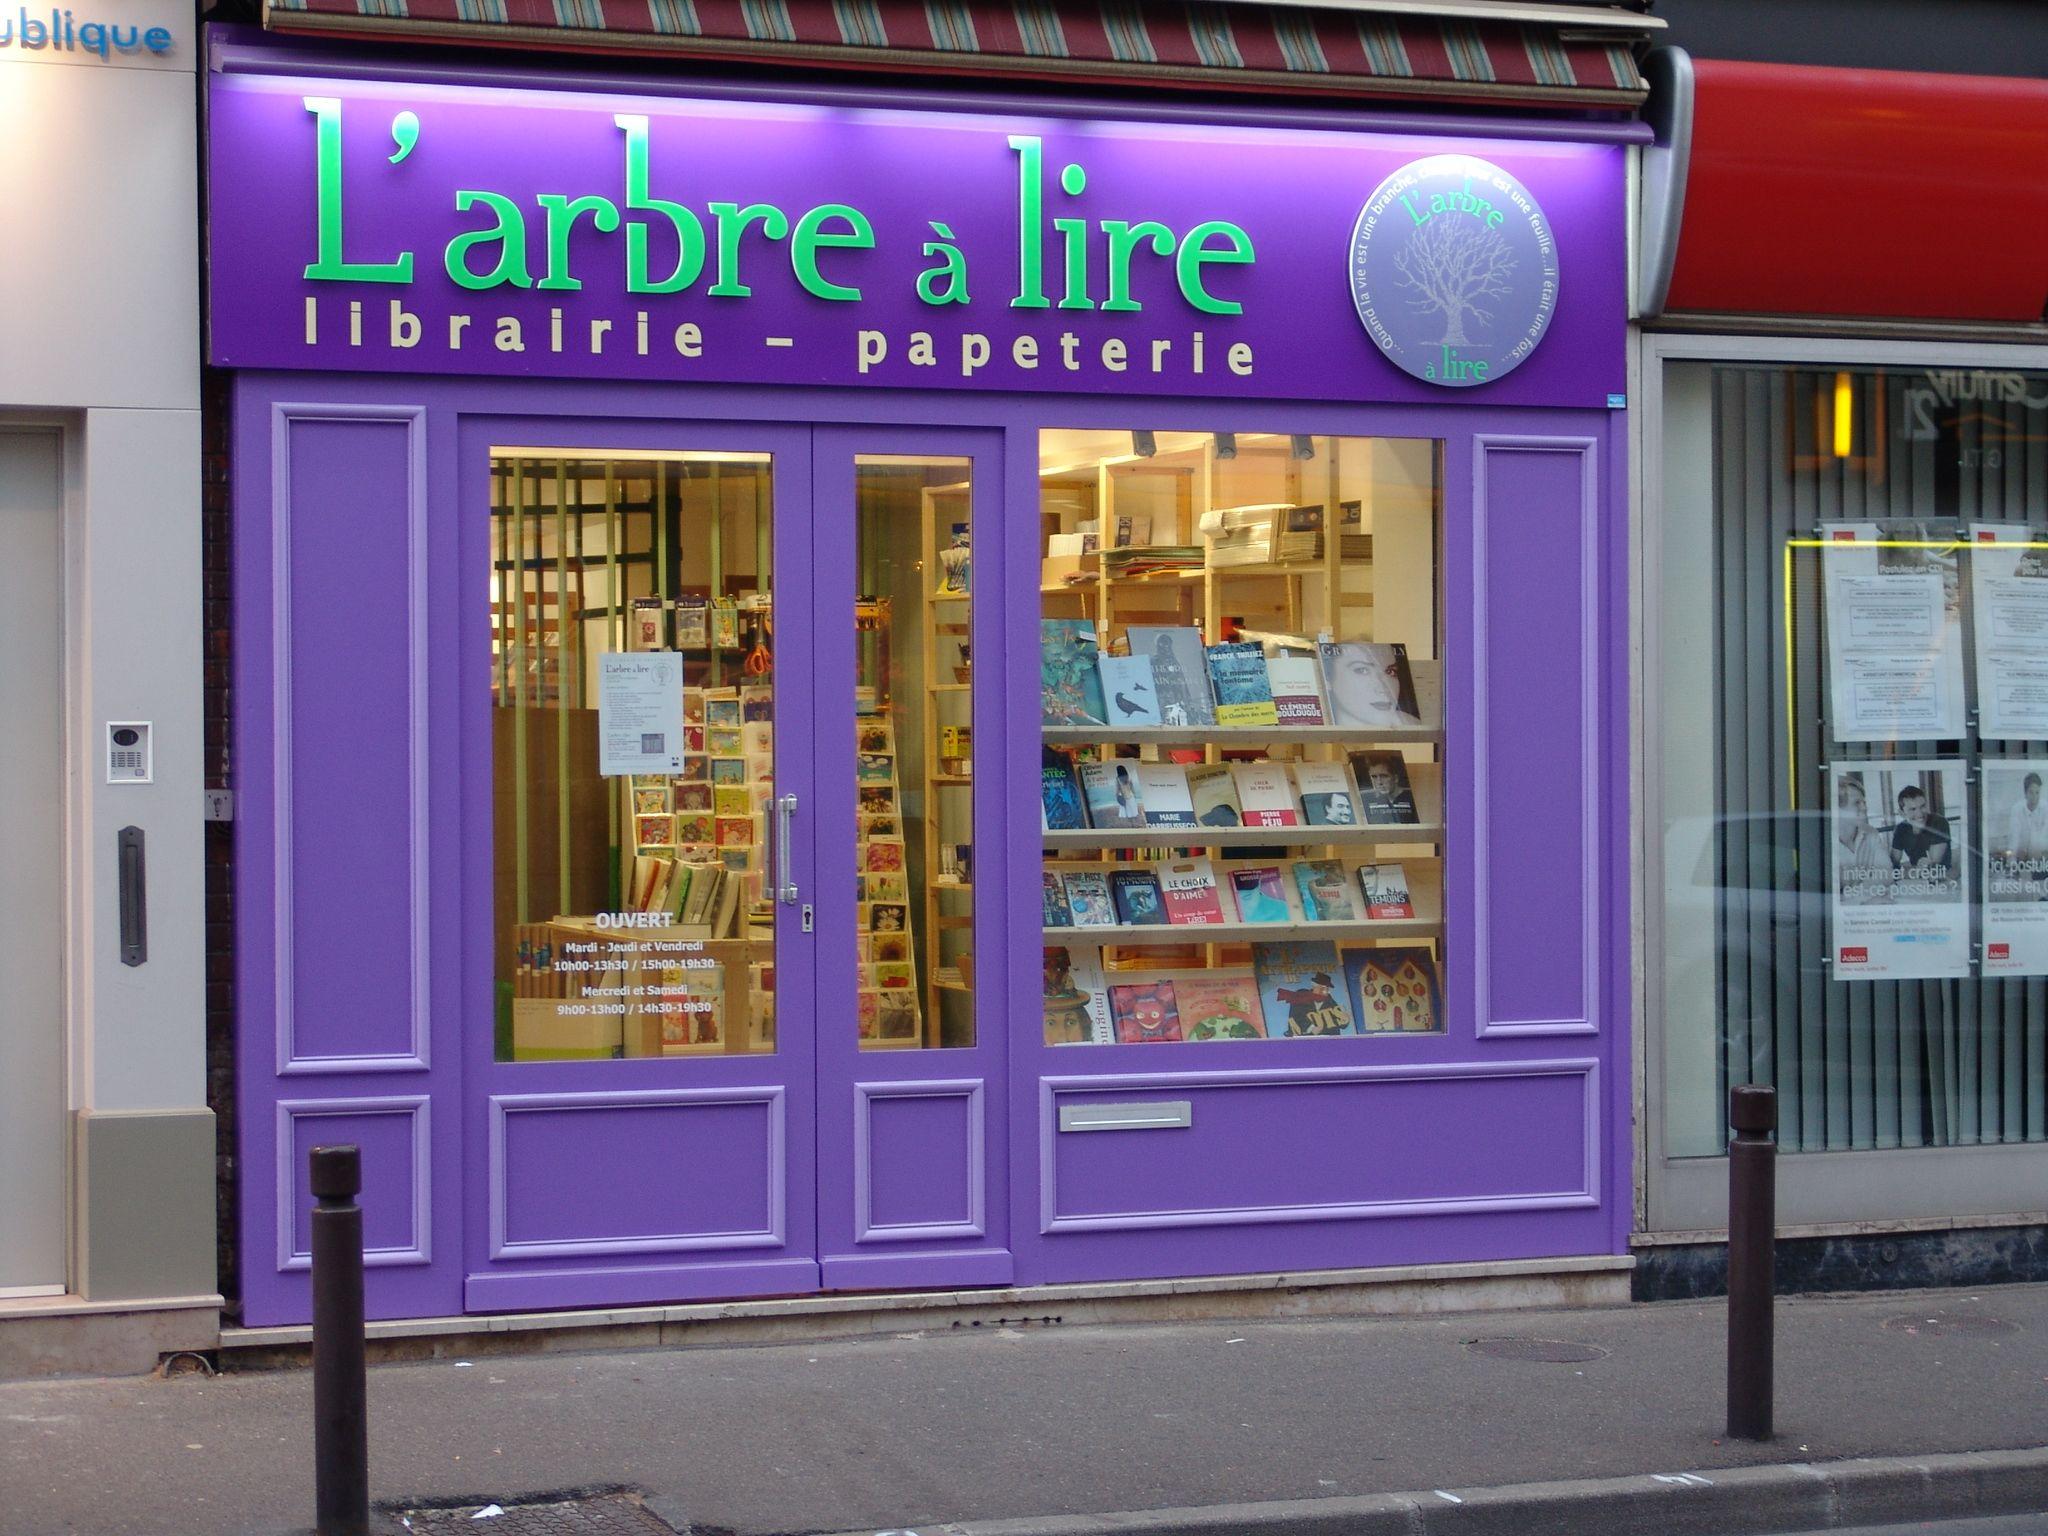 Google Image Result For Http Www Rue Des Livres Com Images Lieux 912 Jpg Librairie Facade Boutique Enseignes Magasin